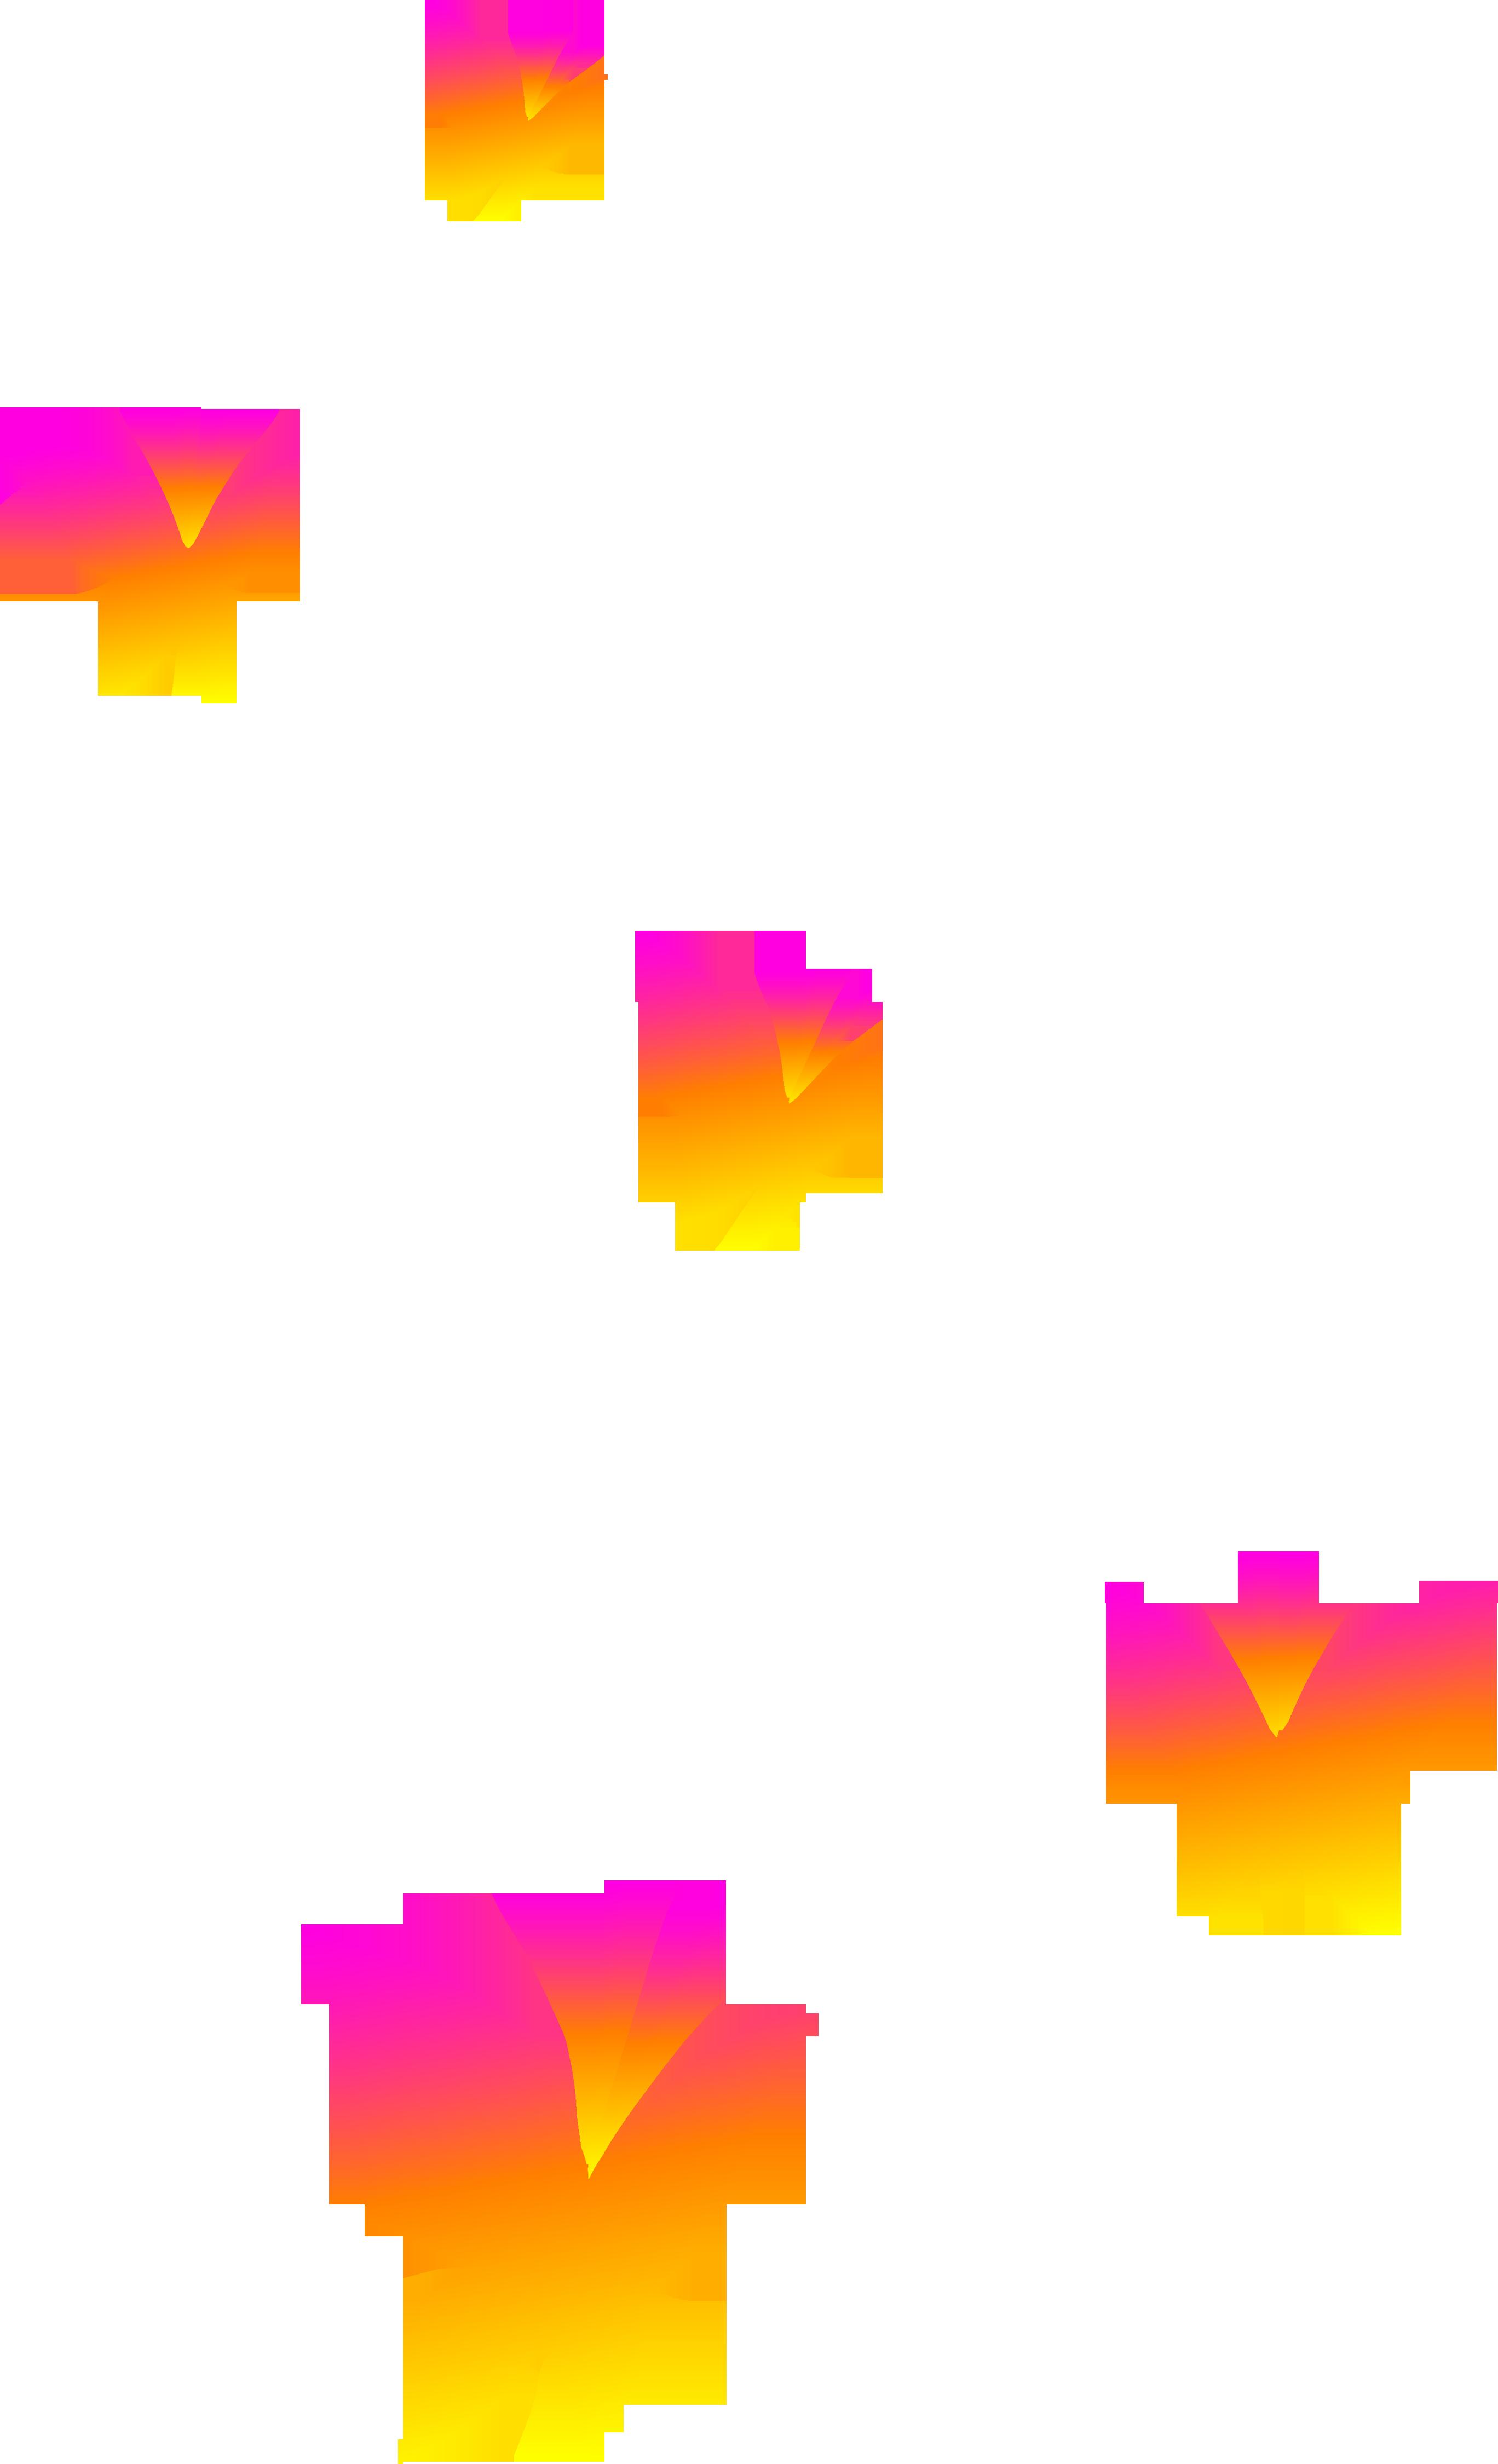 butterfly clip art | Pink Orange and Yellow Butterflies - Free Clip Art